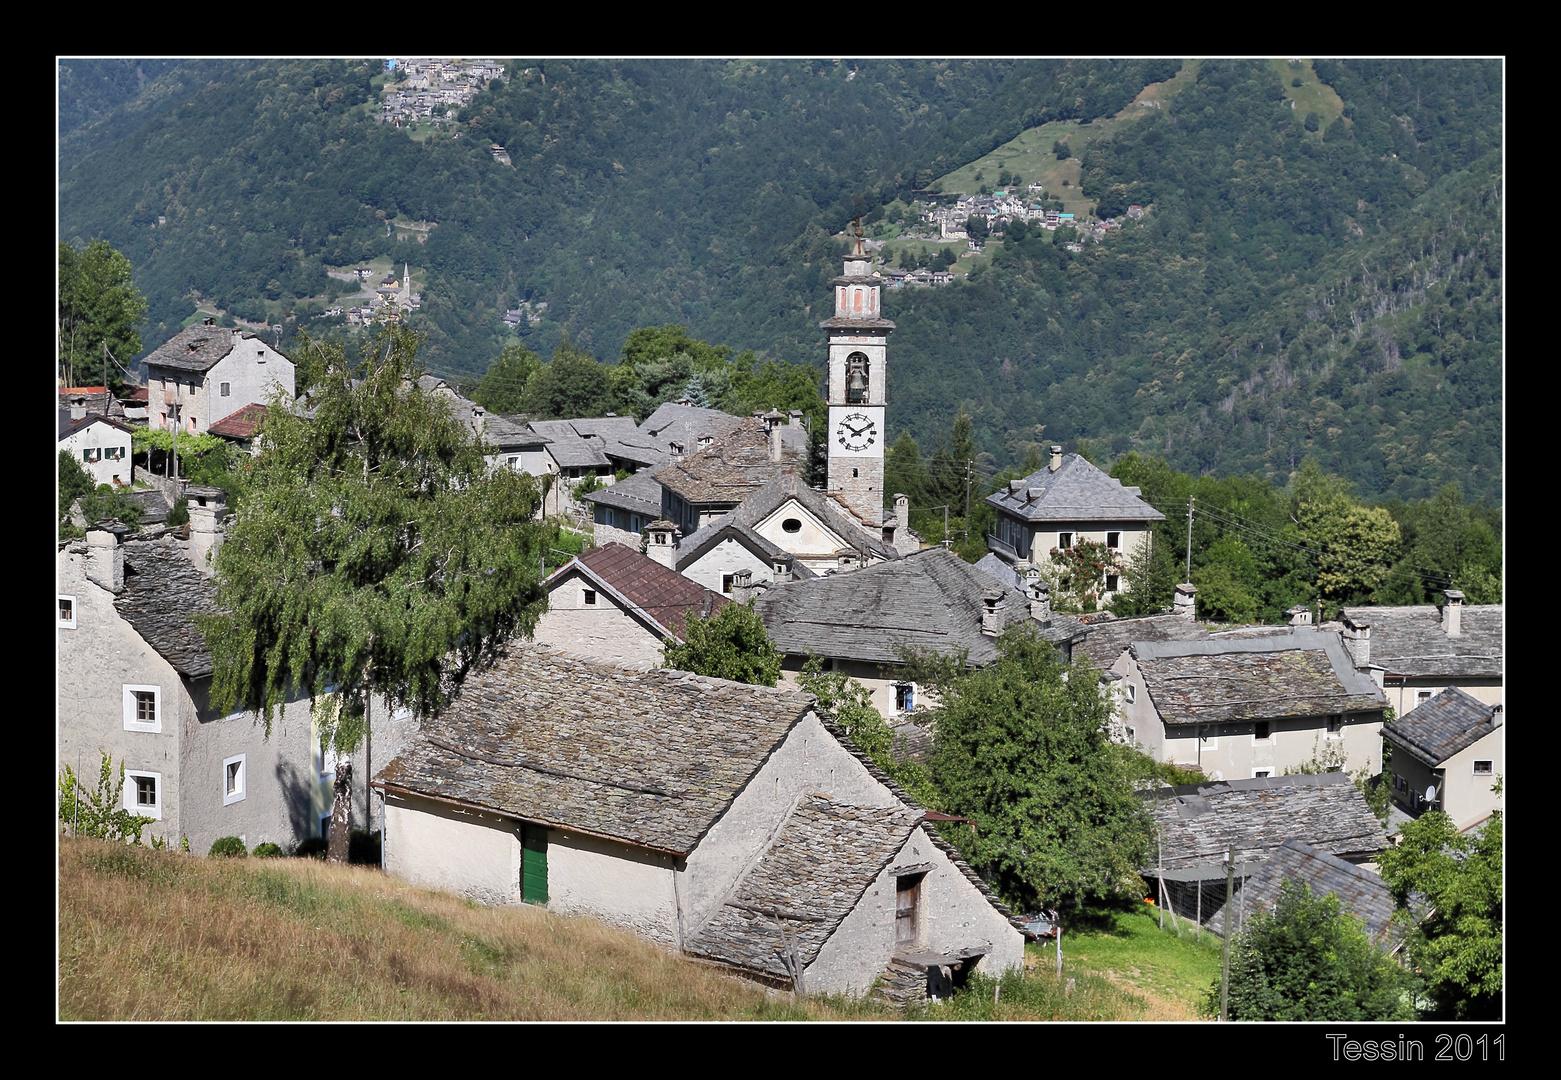 Tessin 2011 Rasa - das Dorf